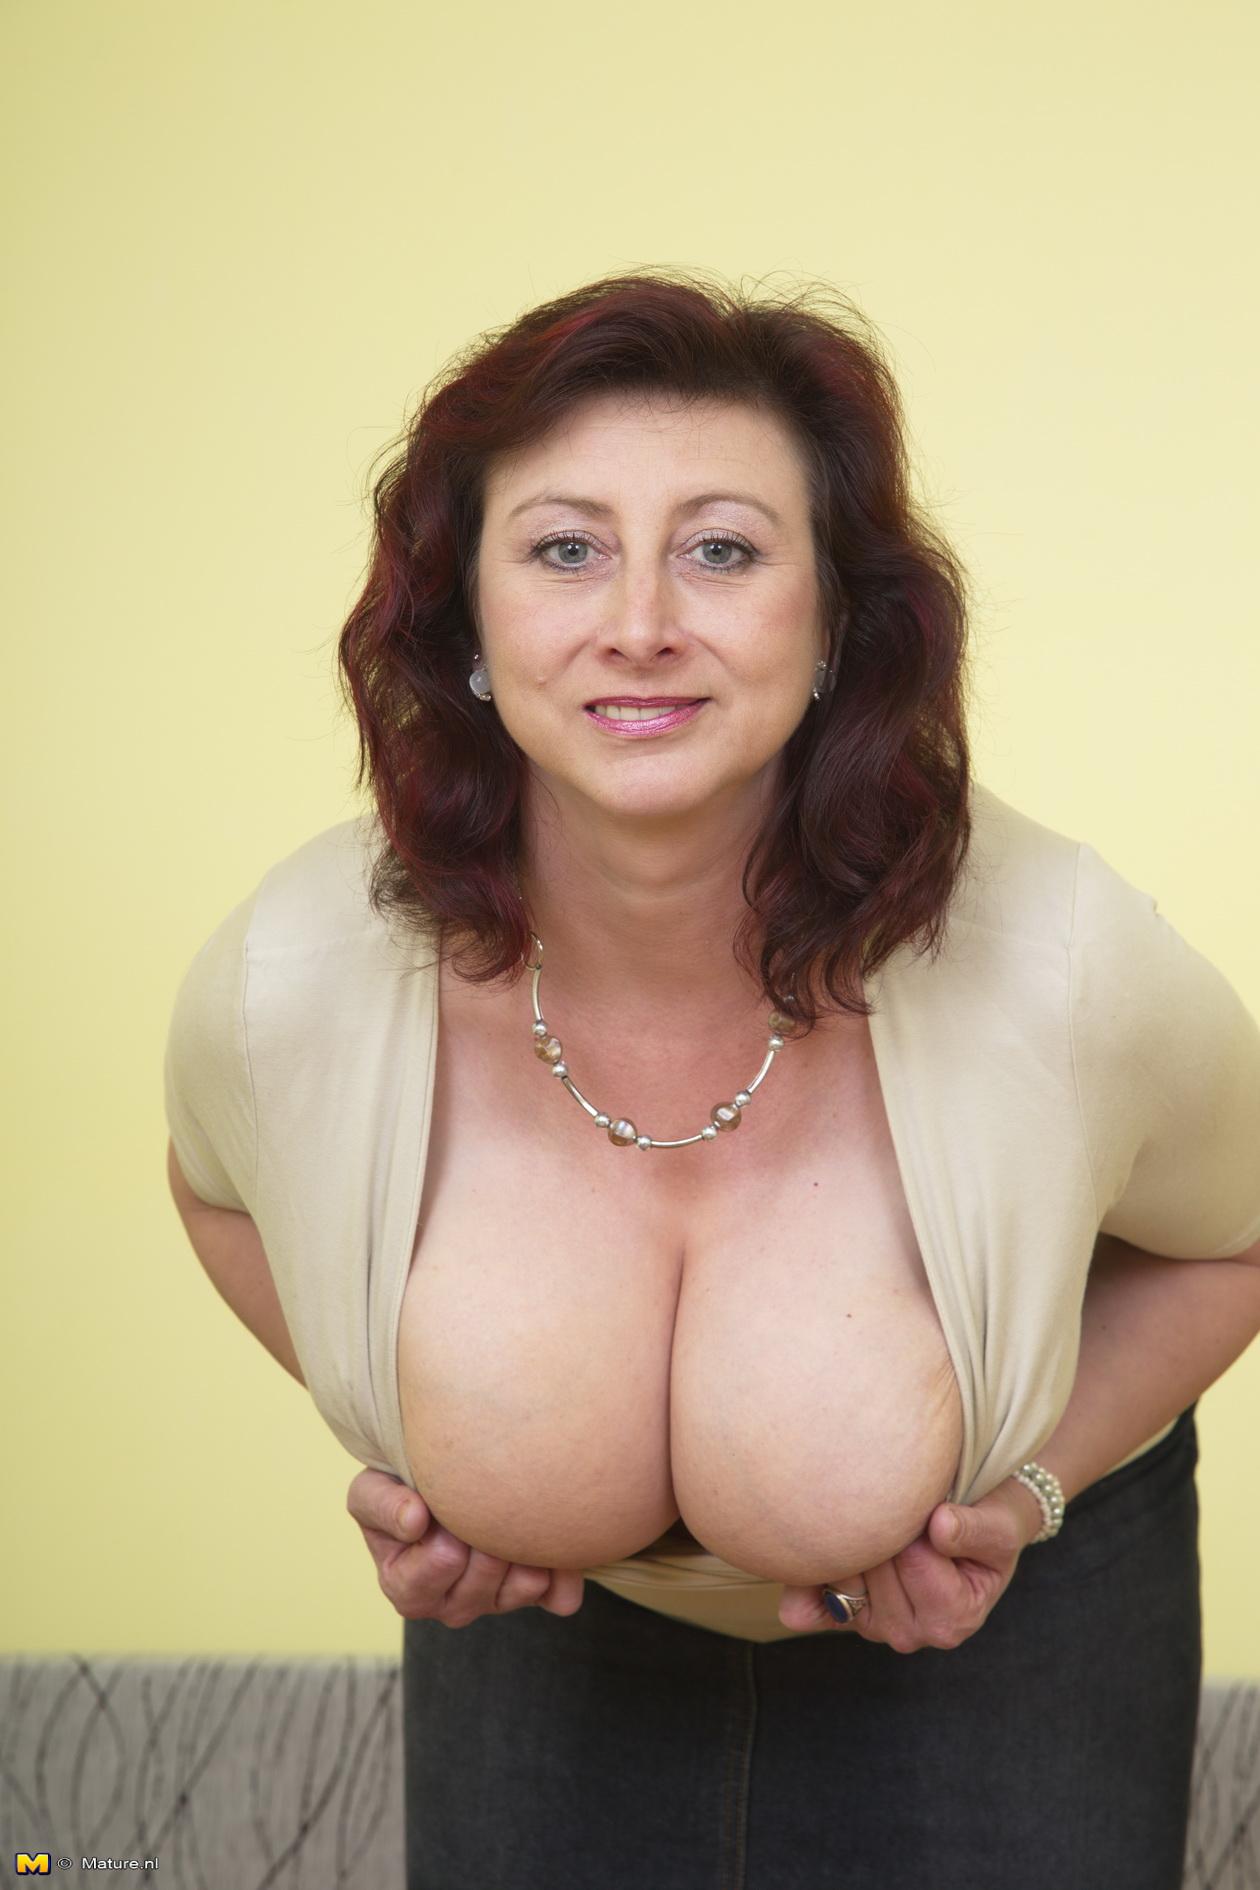 kendte bryster escort 6